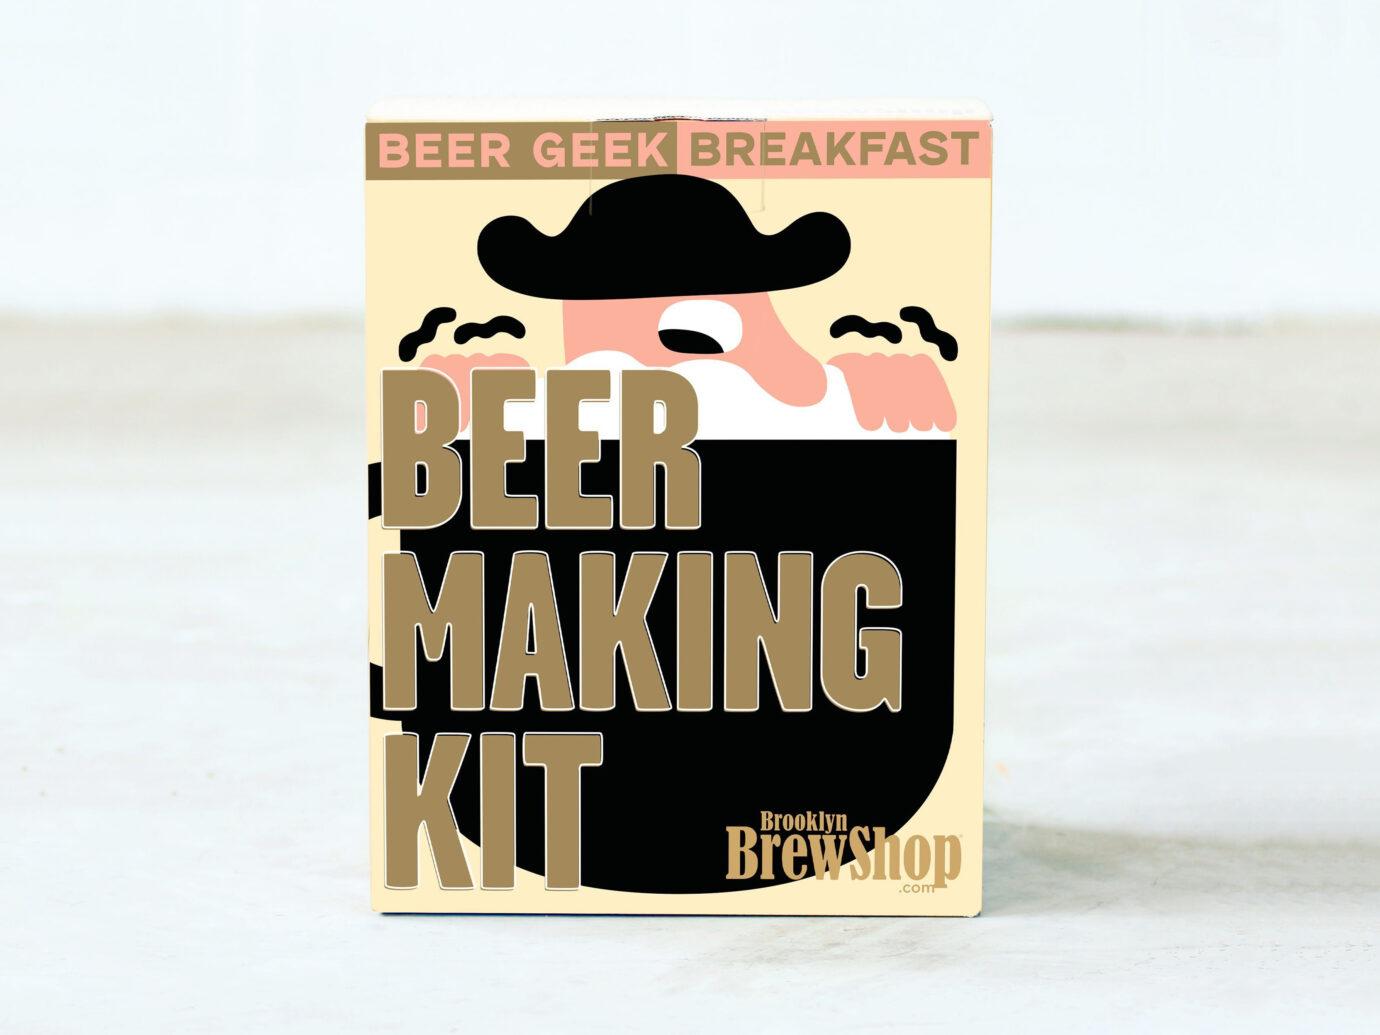 Brooklyn Brew Shop X Mikkeller Beer Making Kit